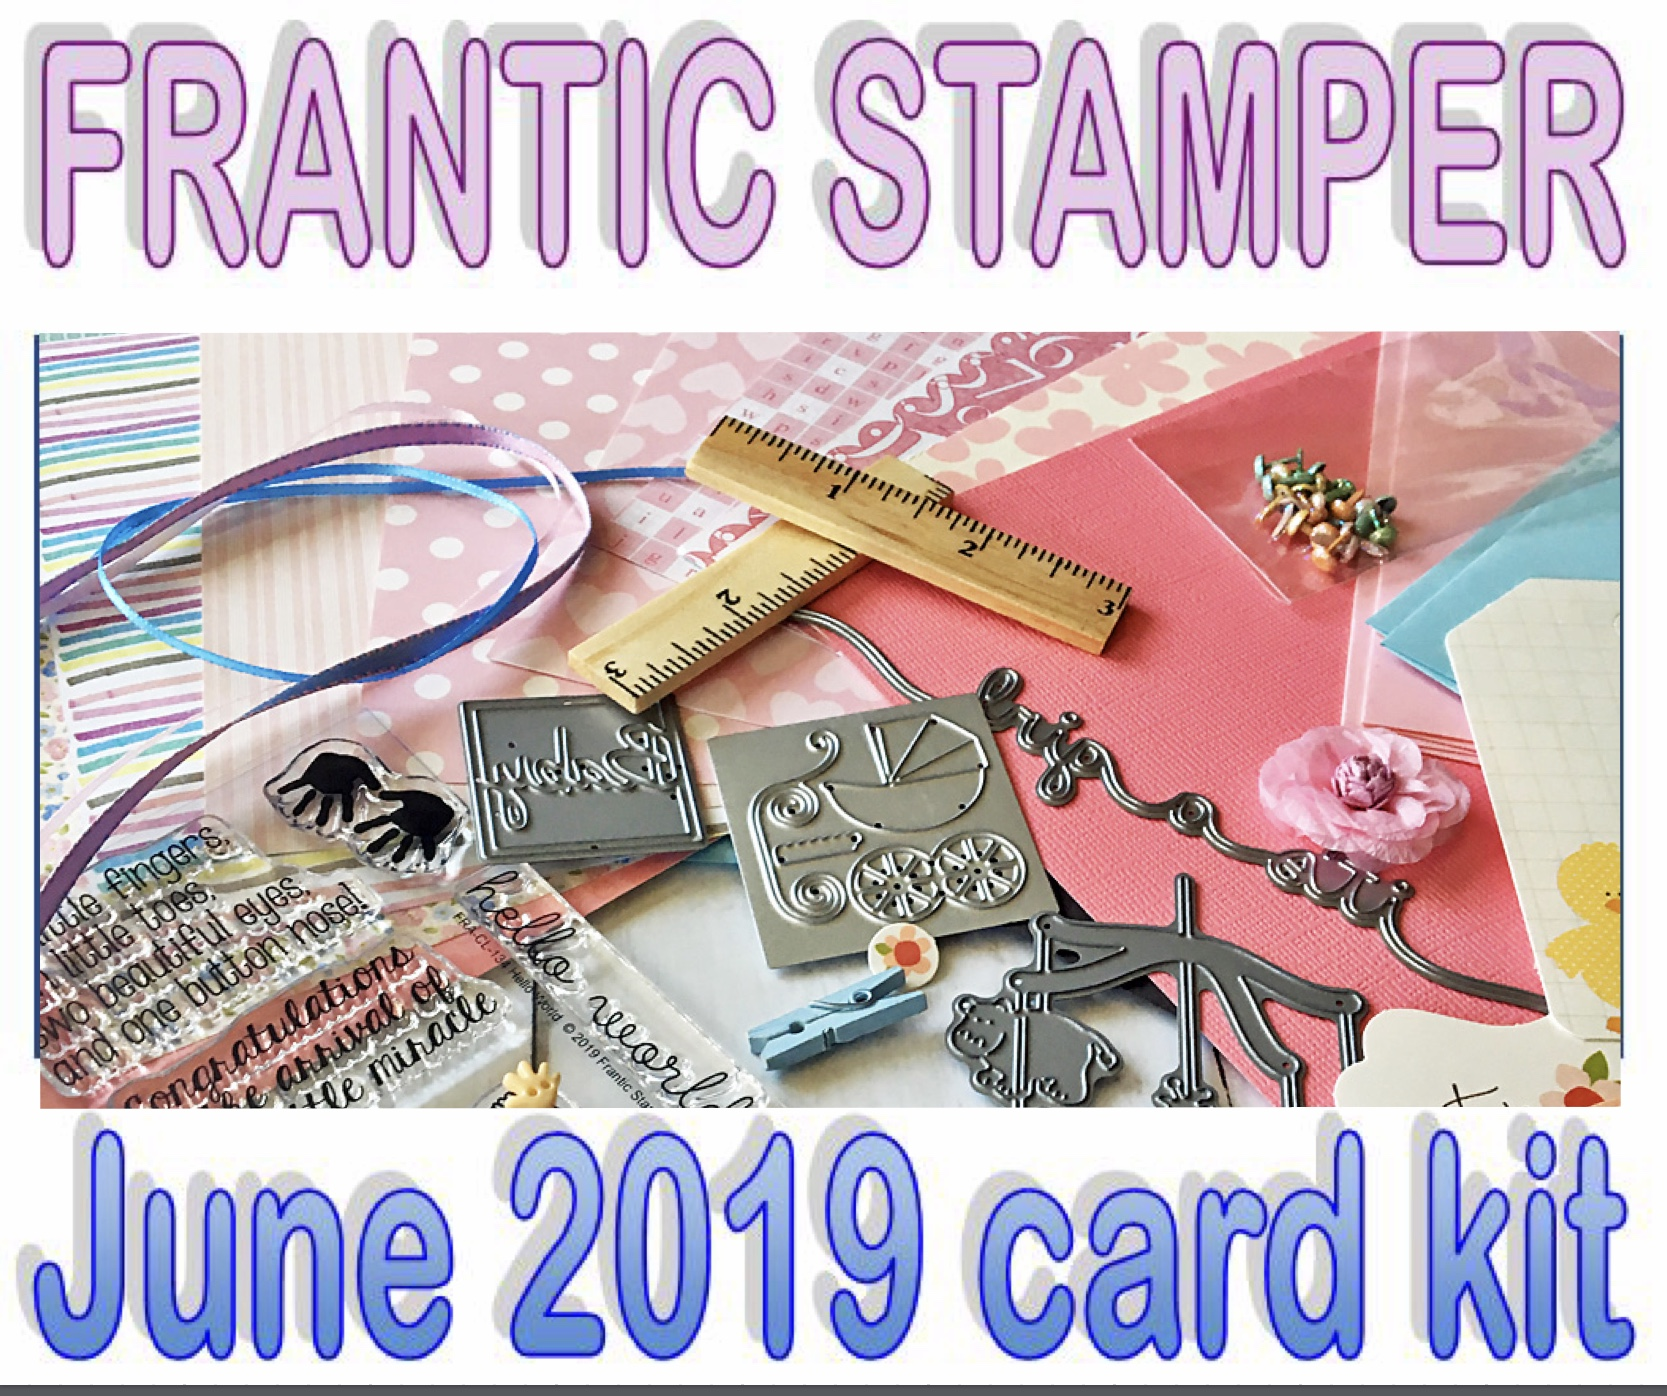 Frantic Stamper June Card Kit